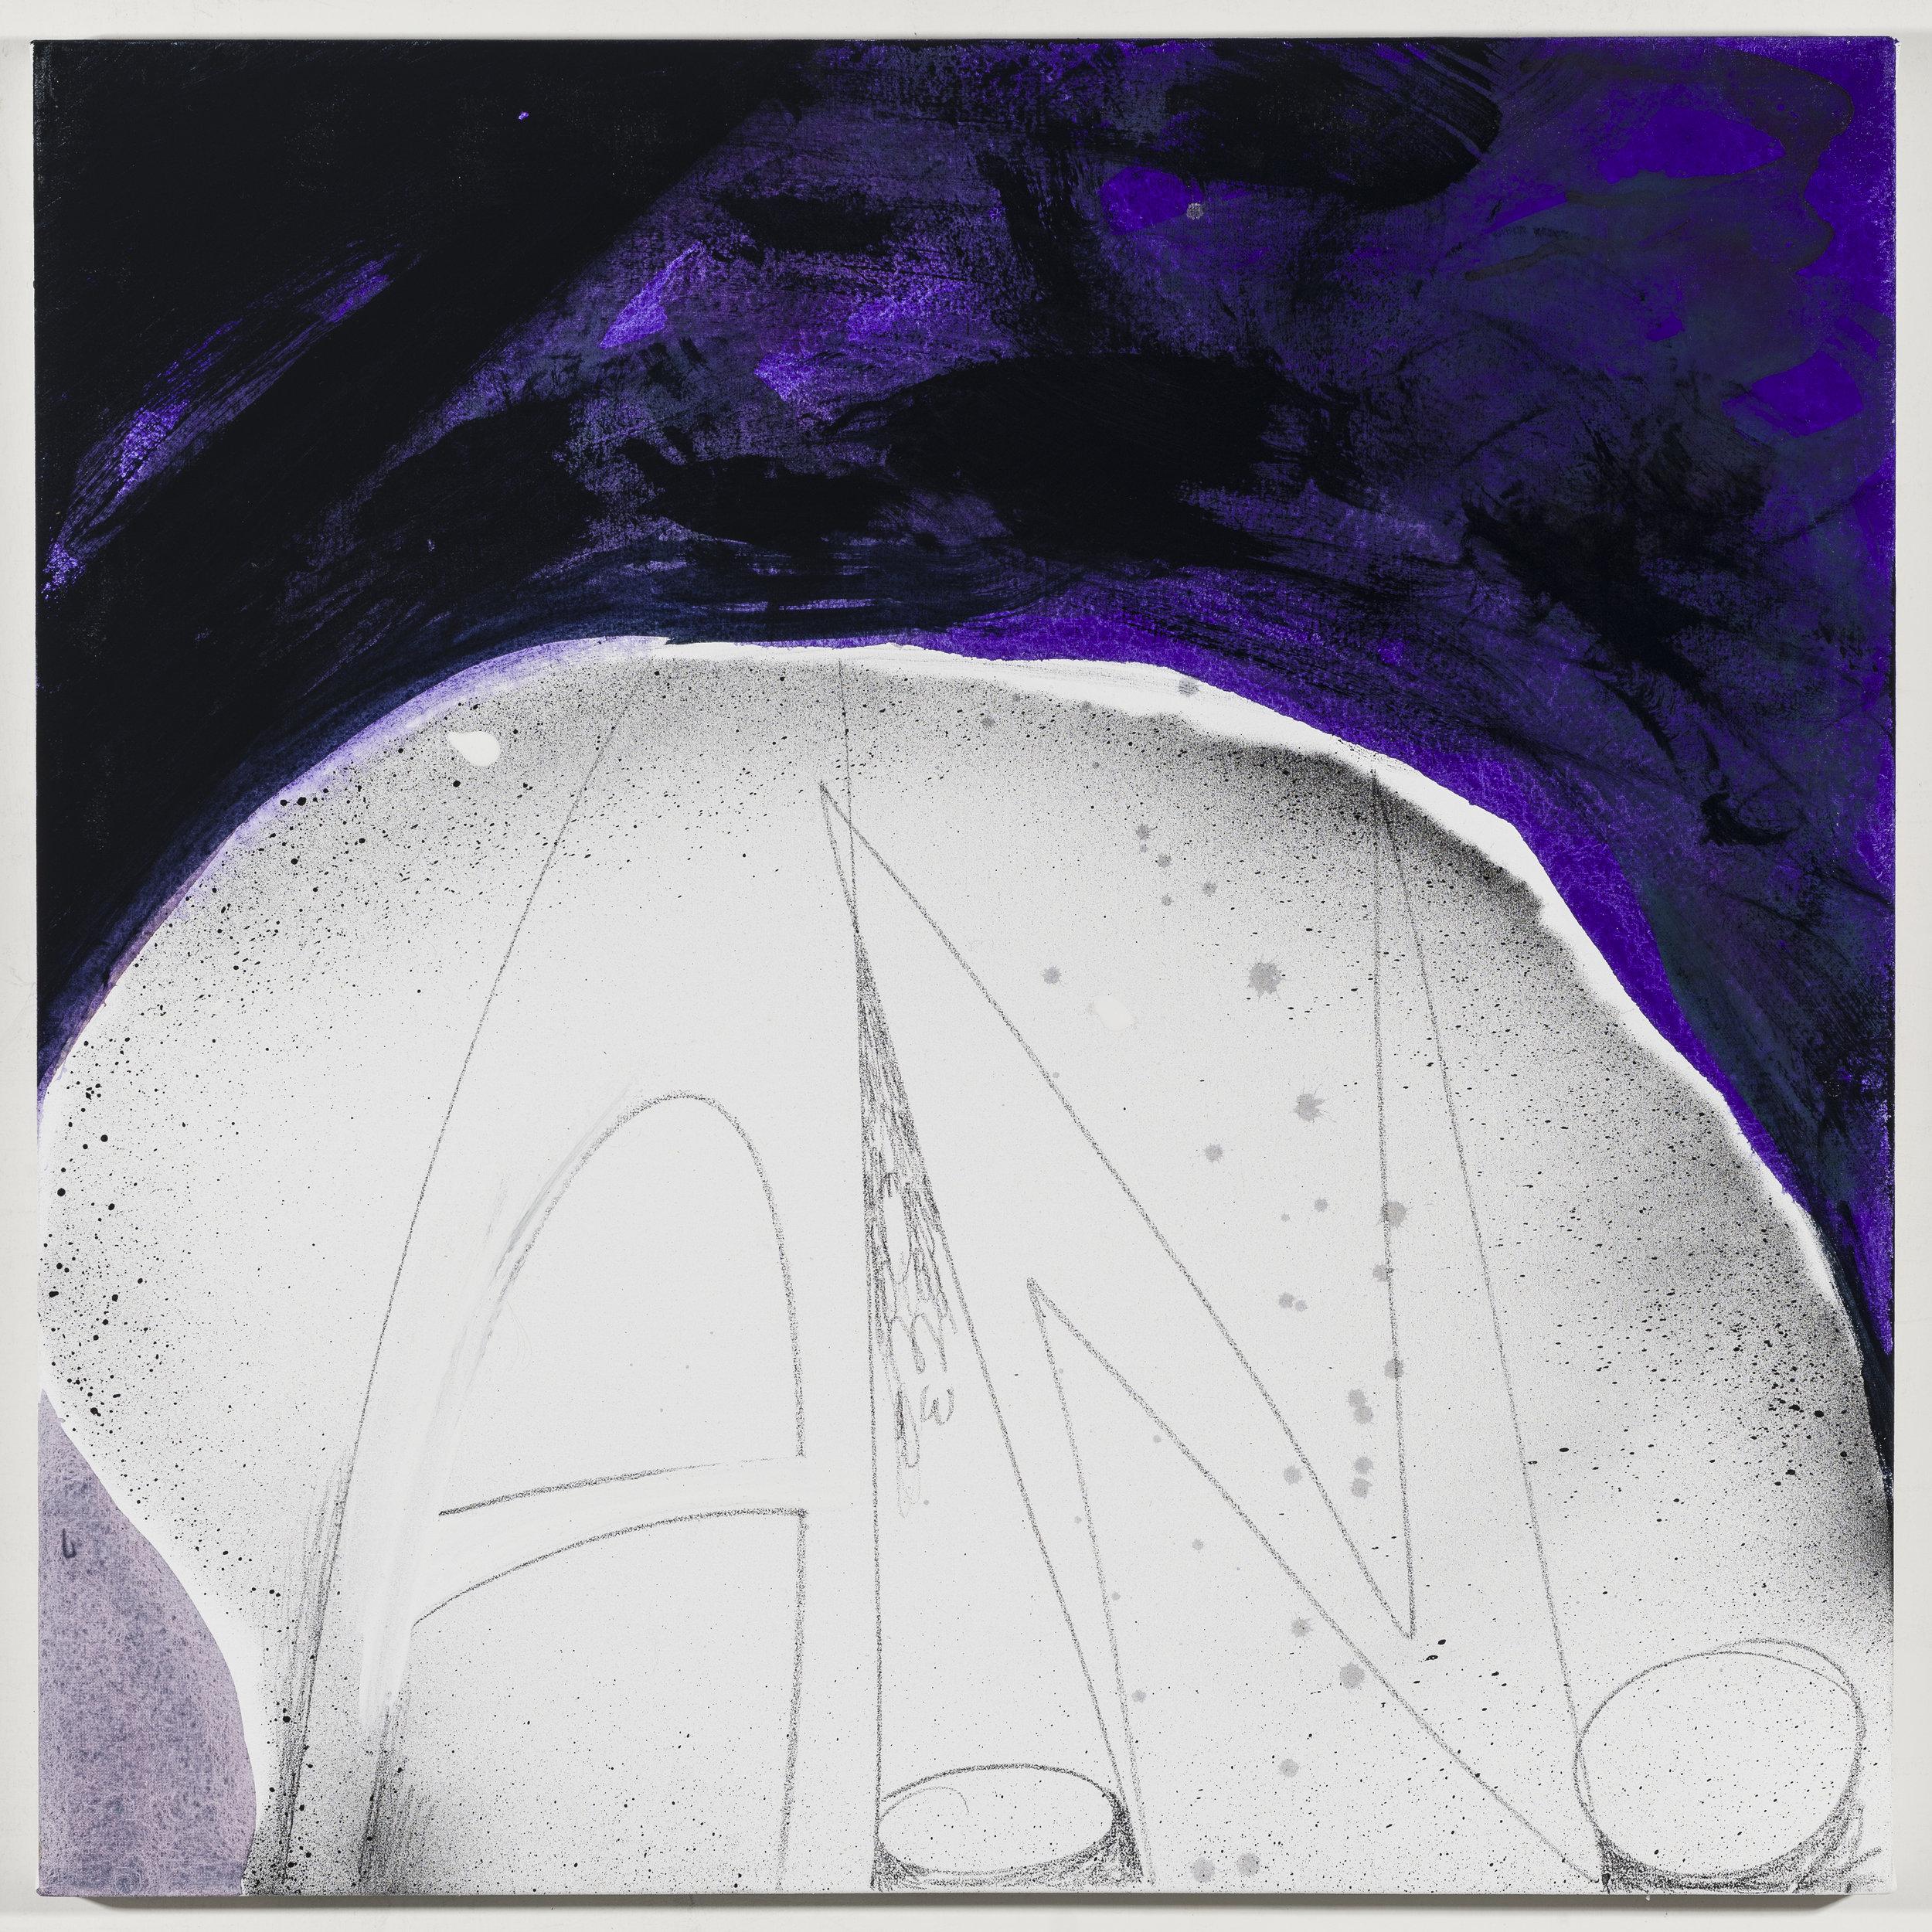 Initials: Aparna Nancherla   2018  Graphite and acrylic on canvas  20 x 20 inches; 51 x 51 cm